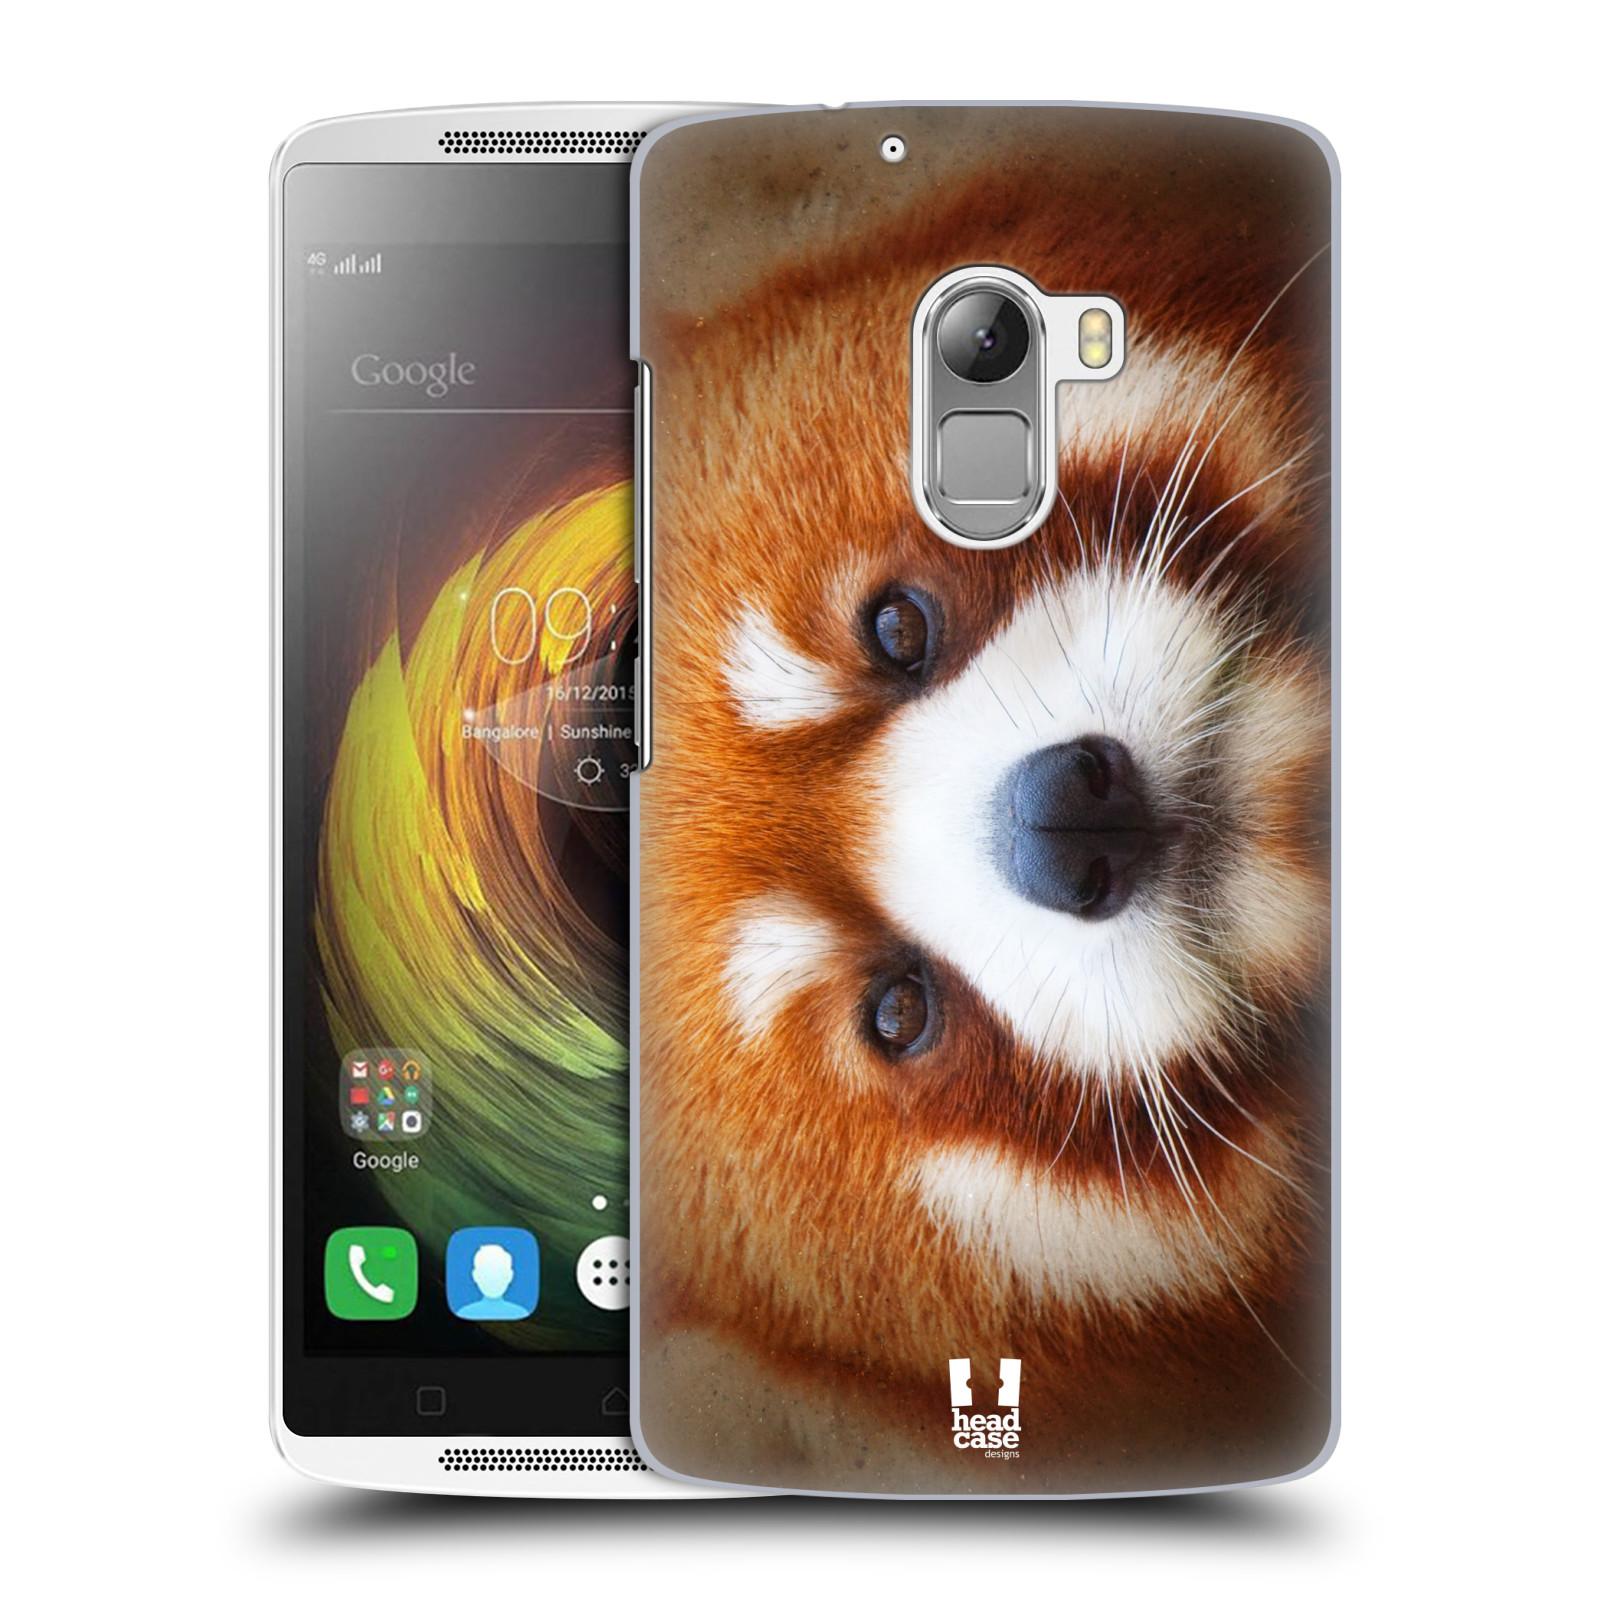 HEAD CASE pevný plastový obal na mobil LENOVO A7010 / A7010 DUAL / K4 Note / Vibe X3 lite vzor Zvířecí tváře 2 medvěd panda rudá